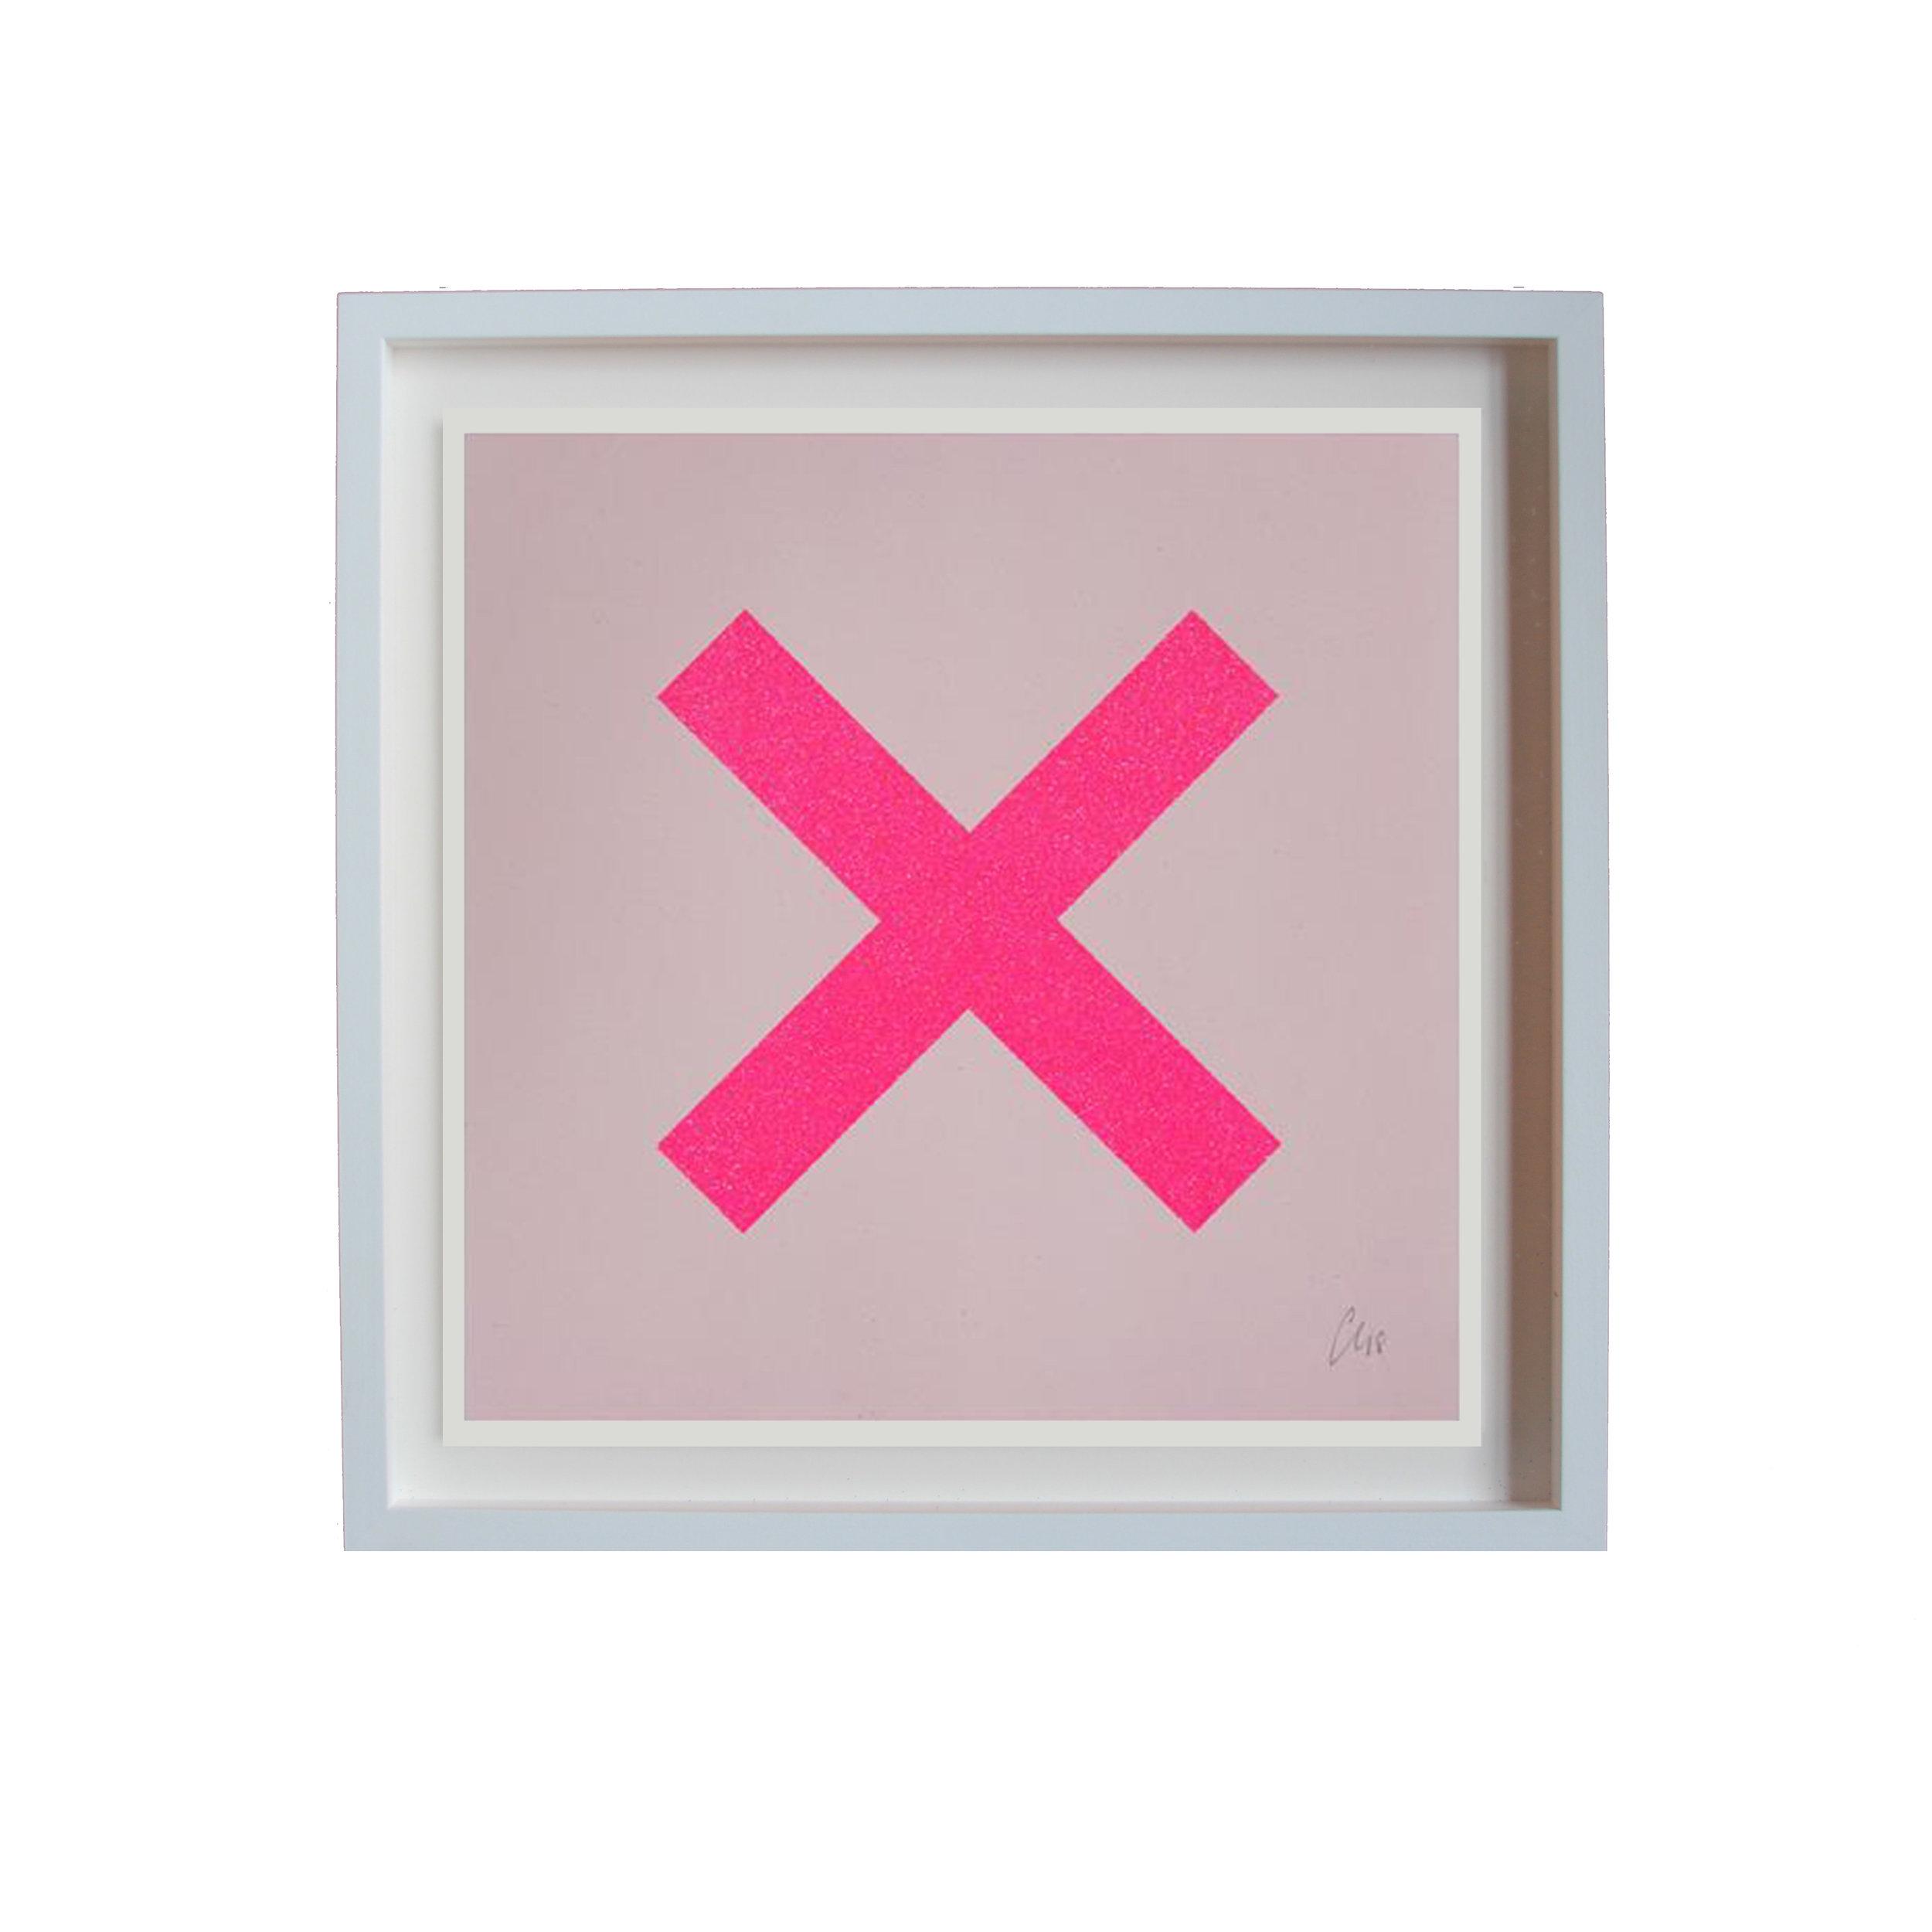 Chris Levine - X Marks the Spot (Pink)